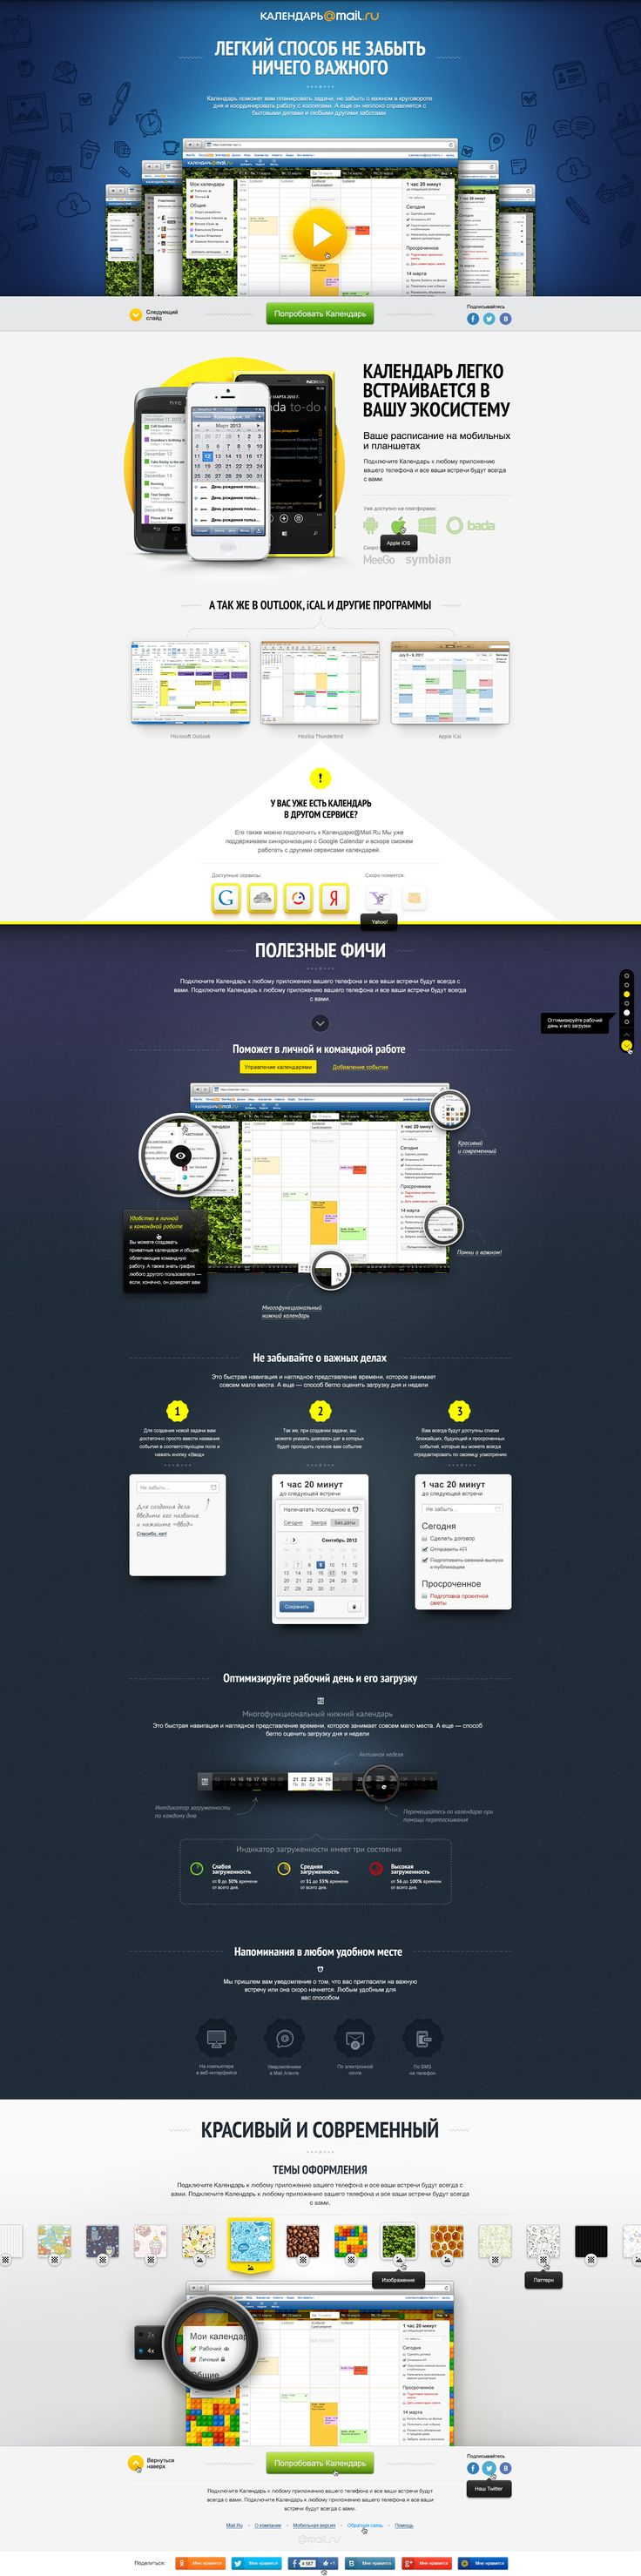 Calendar Promo Site #Webdesign